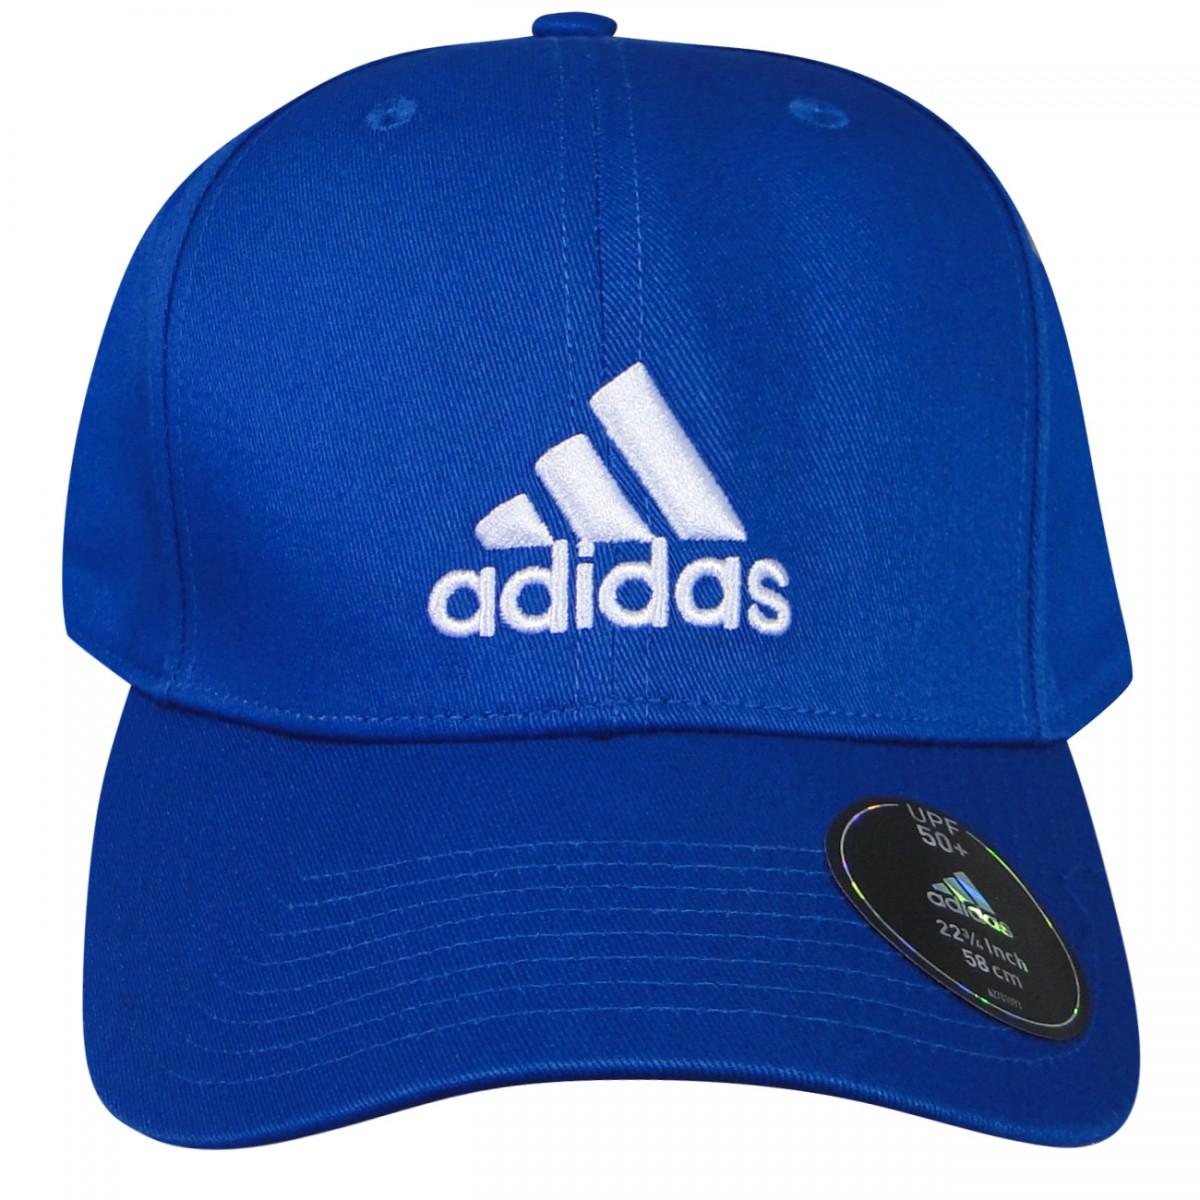 f136d1996c Bone Adidas Perf Cap AJ9219 - Azul - Chuteira Nike, Adidas. Sandalias  Femininas. Sandy Calçados